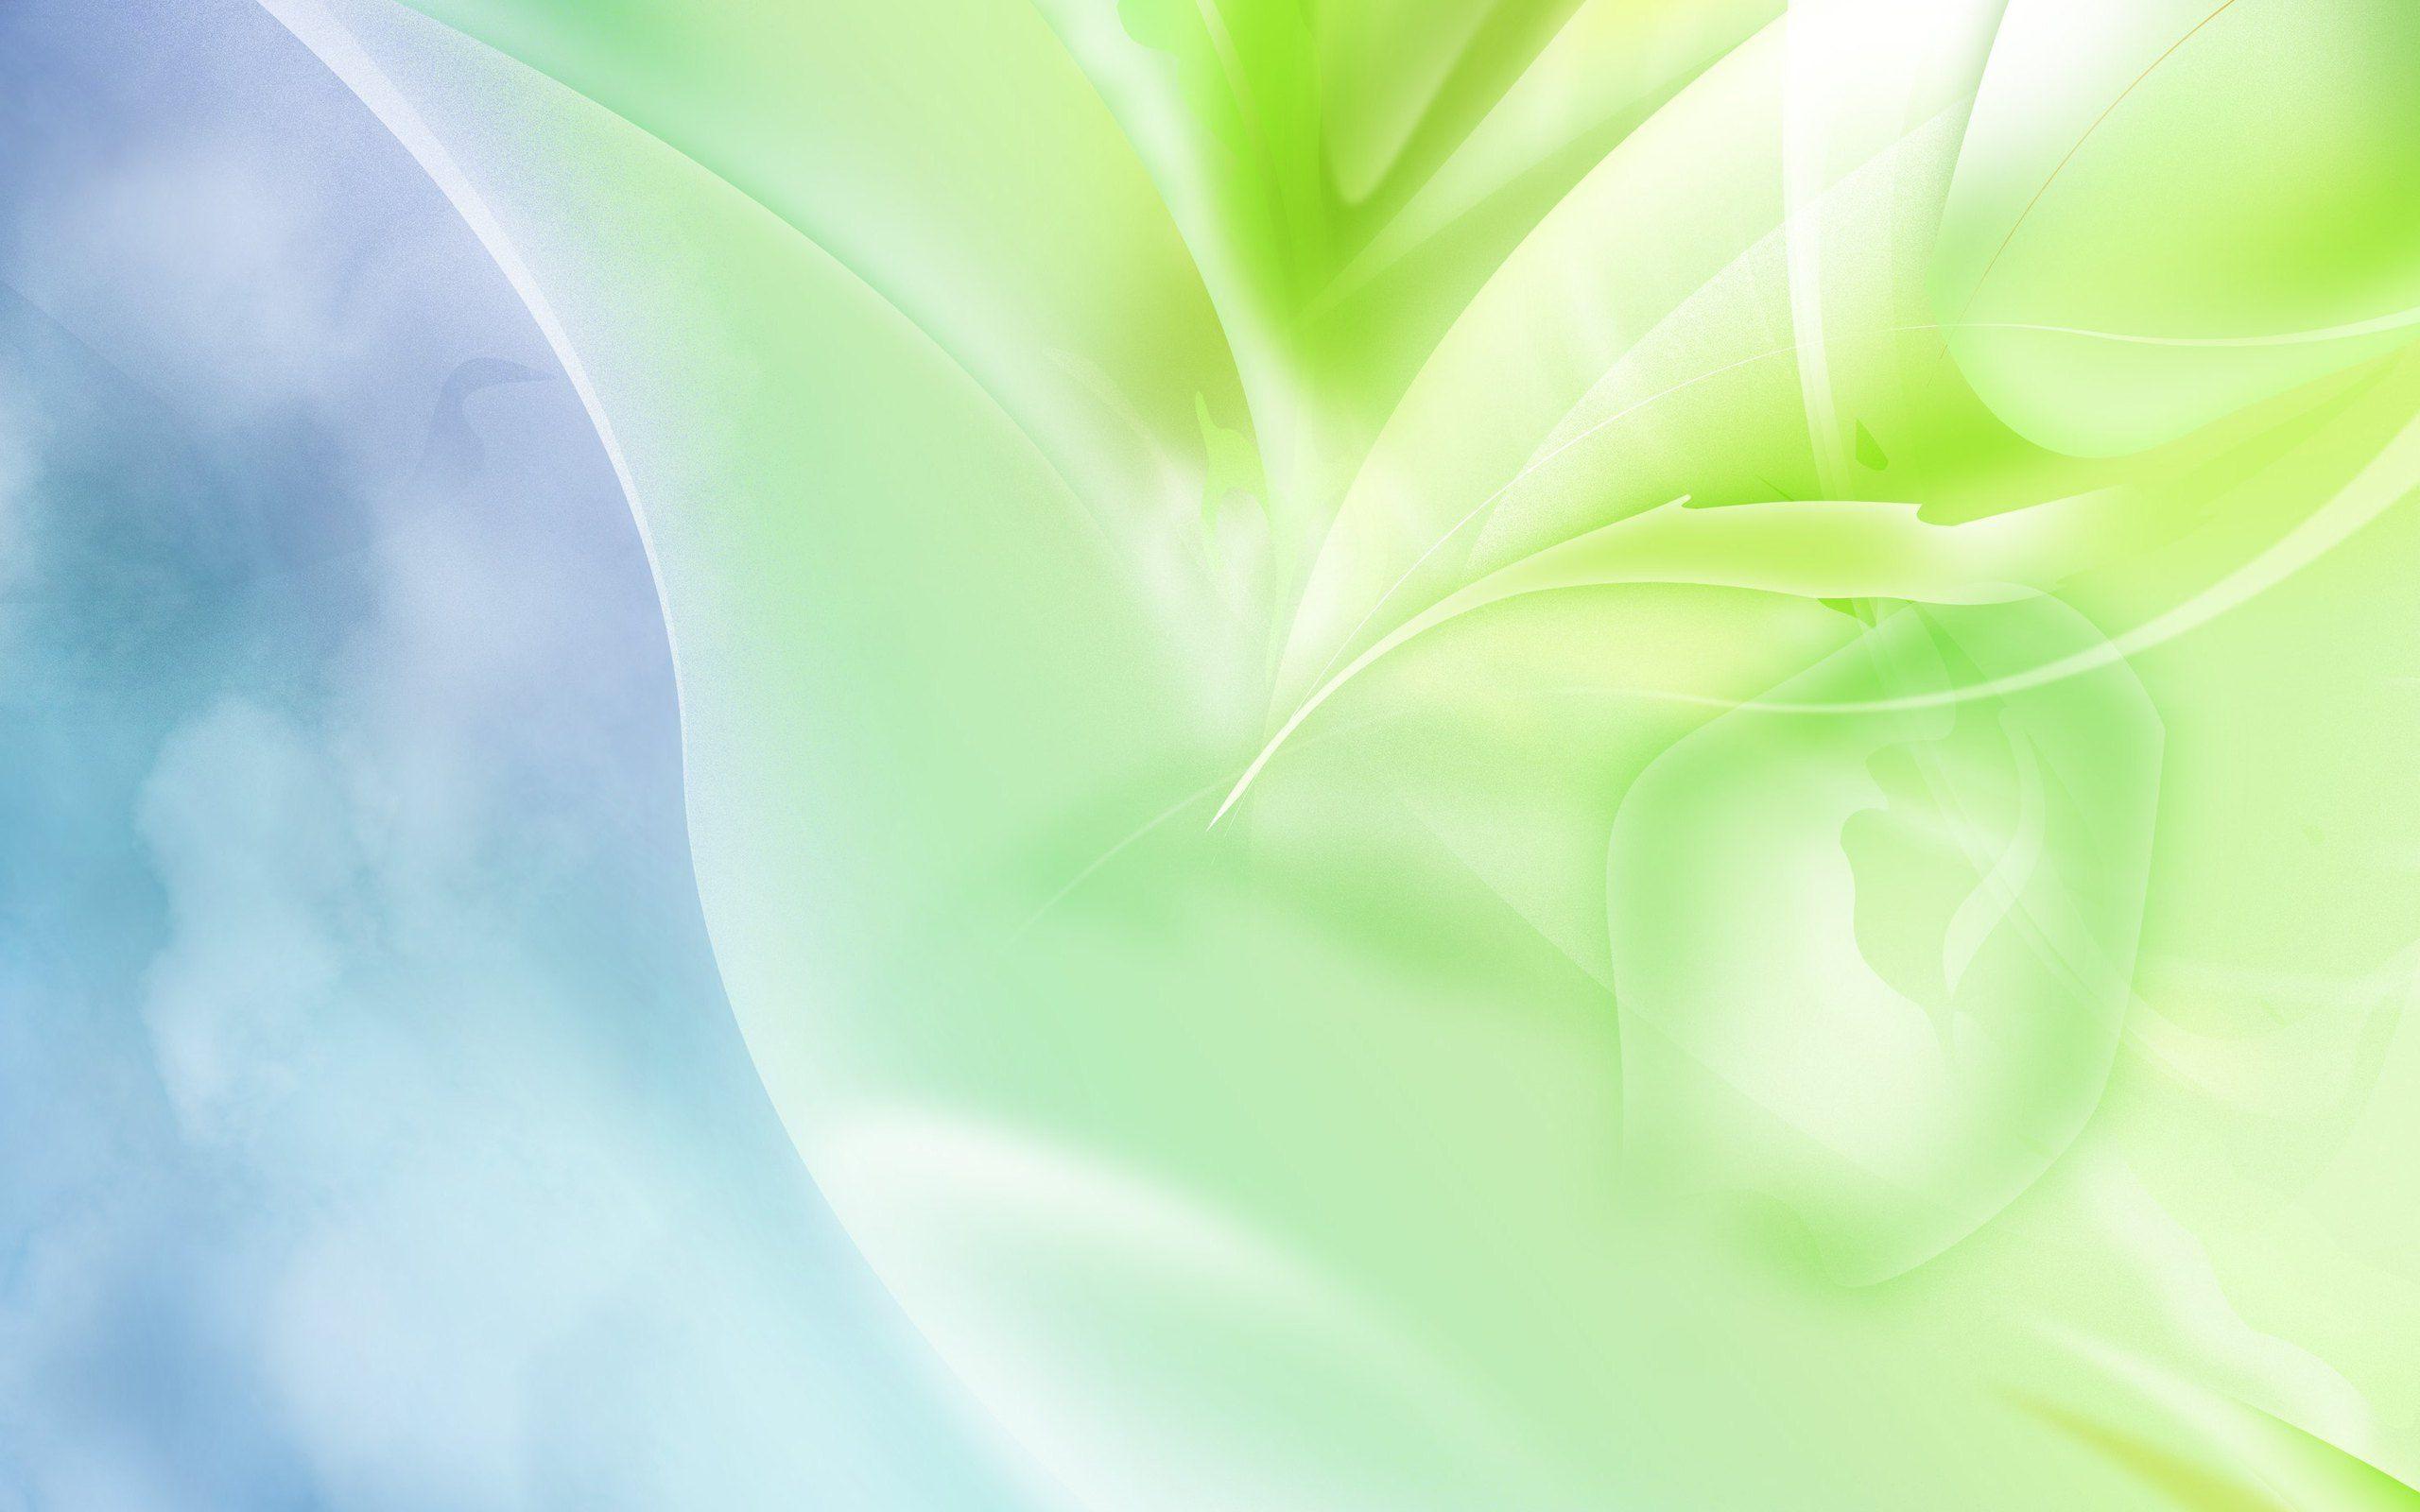 Dove Bagnodoccia ~ Green leaves wallpapers wallpapers pinterest green wallpaper